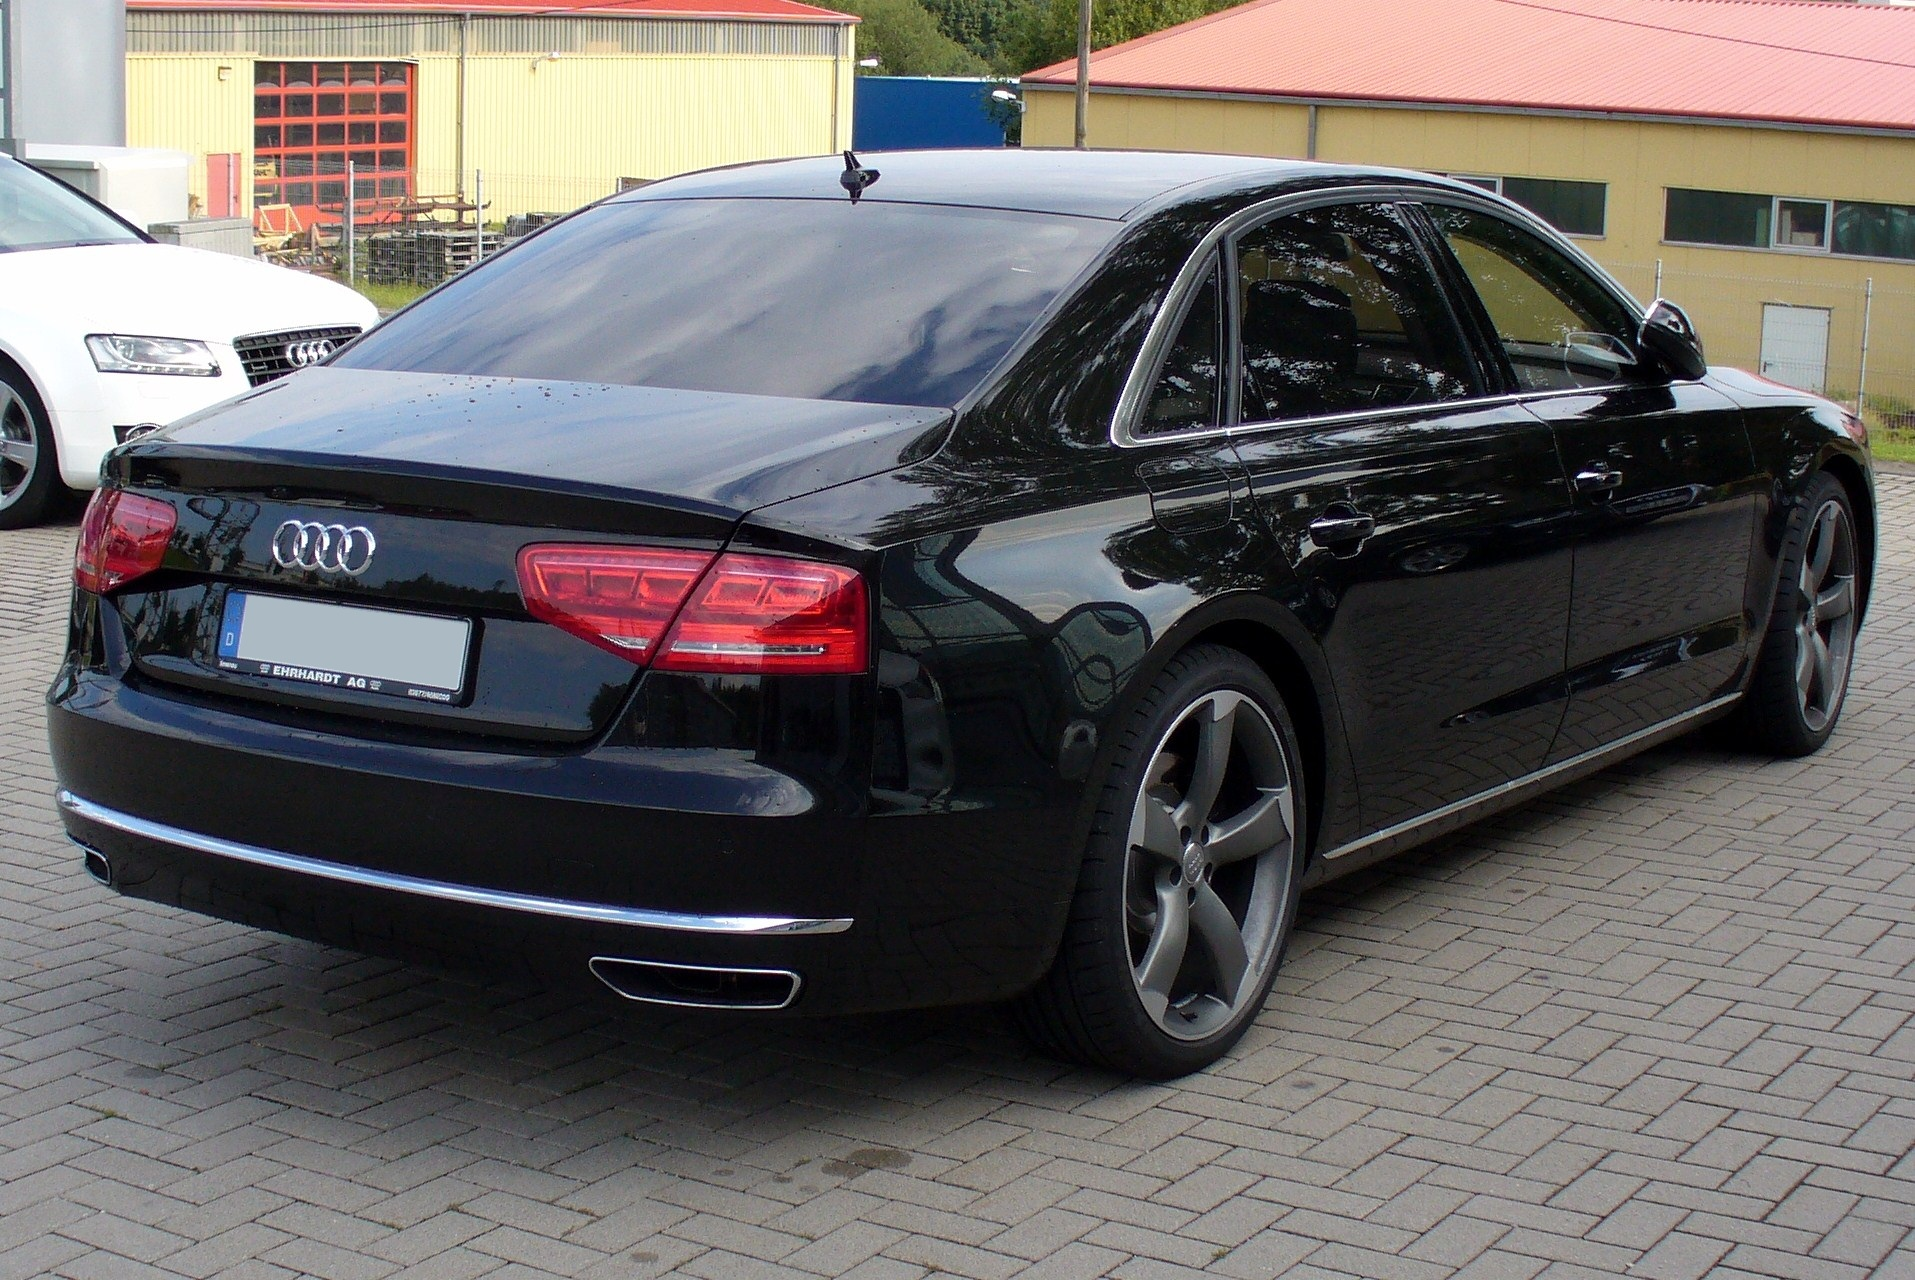 Audi_A8_L_W12_quattro_tiptronic_Phantomschwarz_Heck.JPG